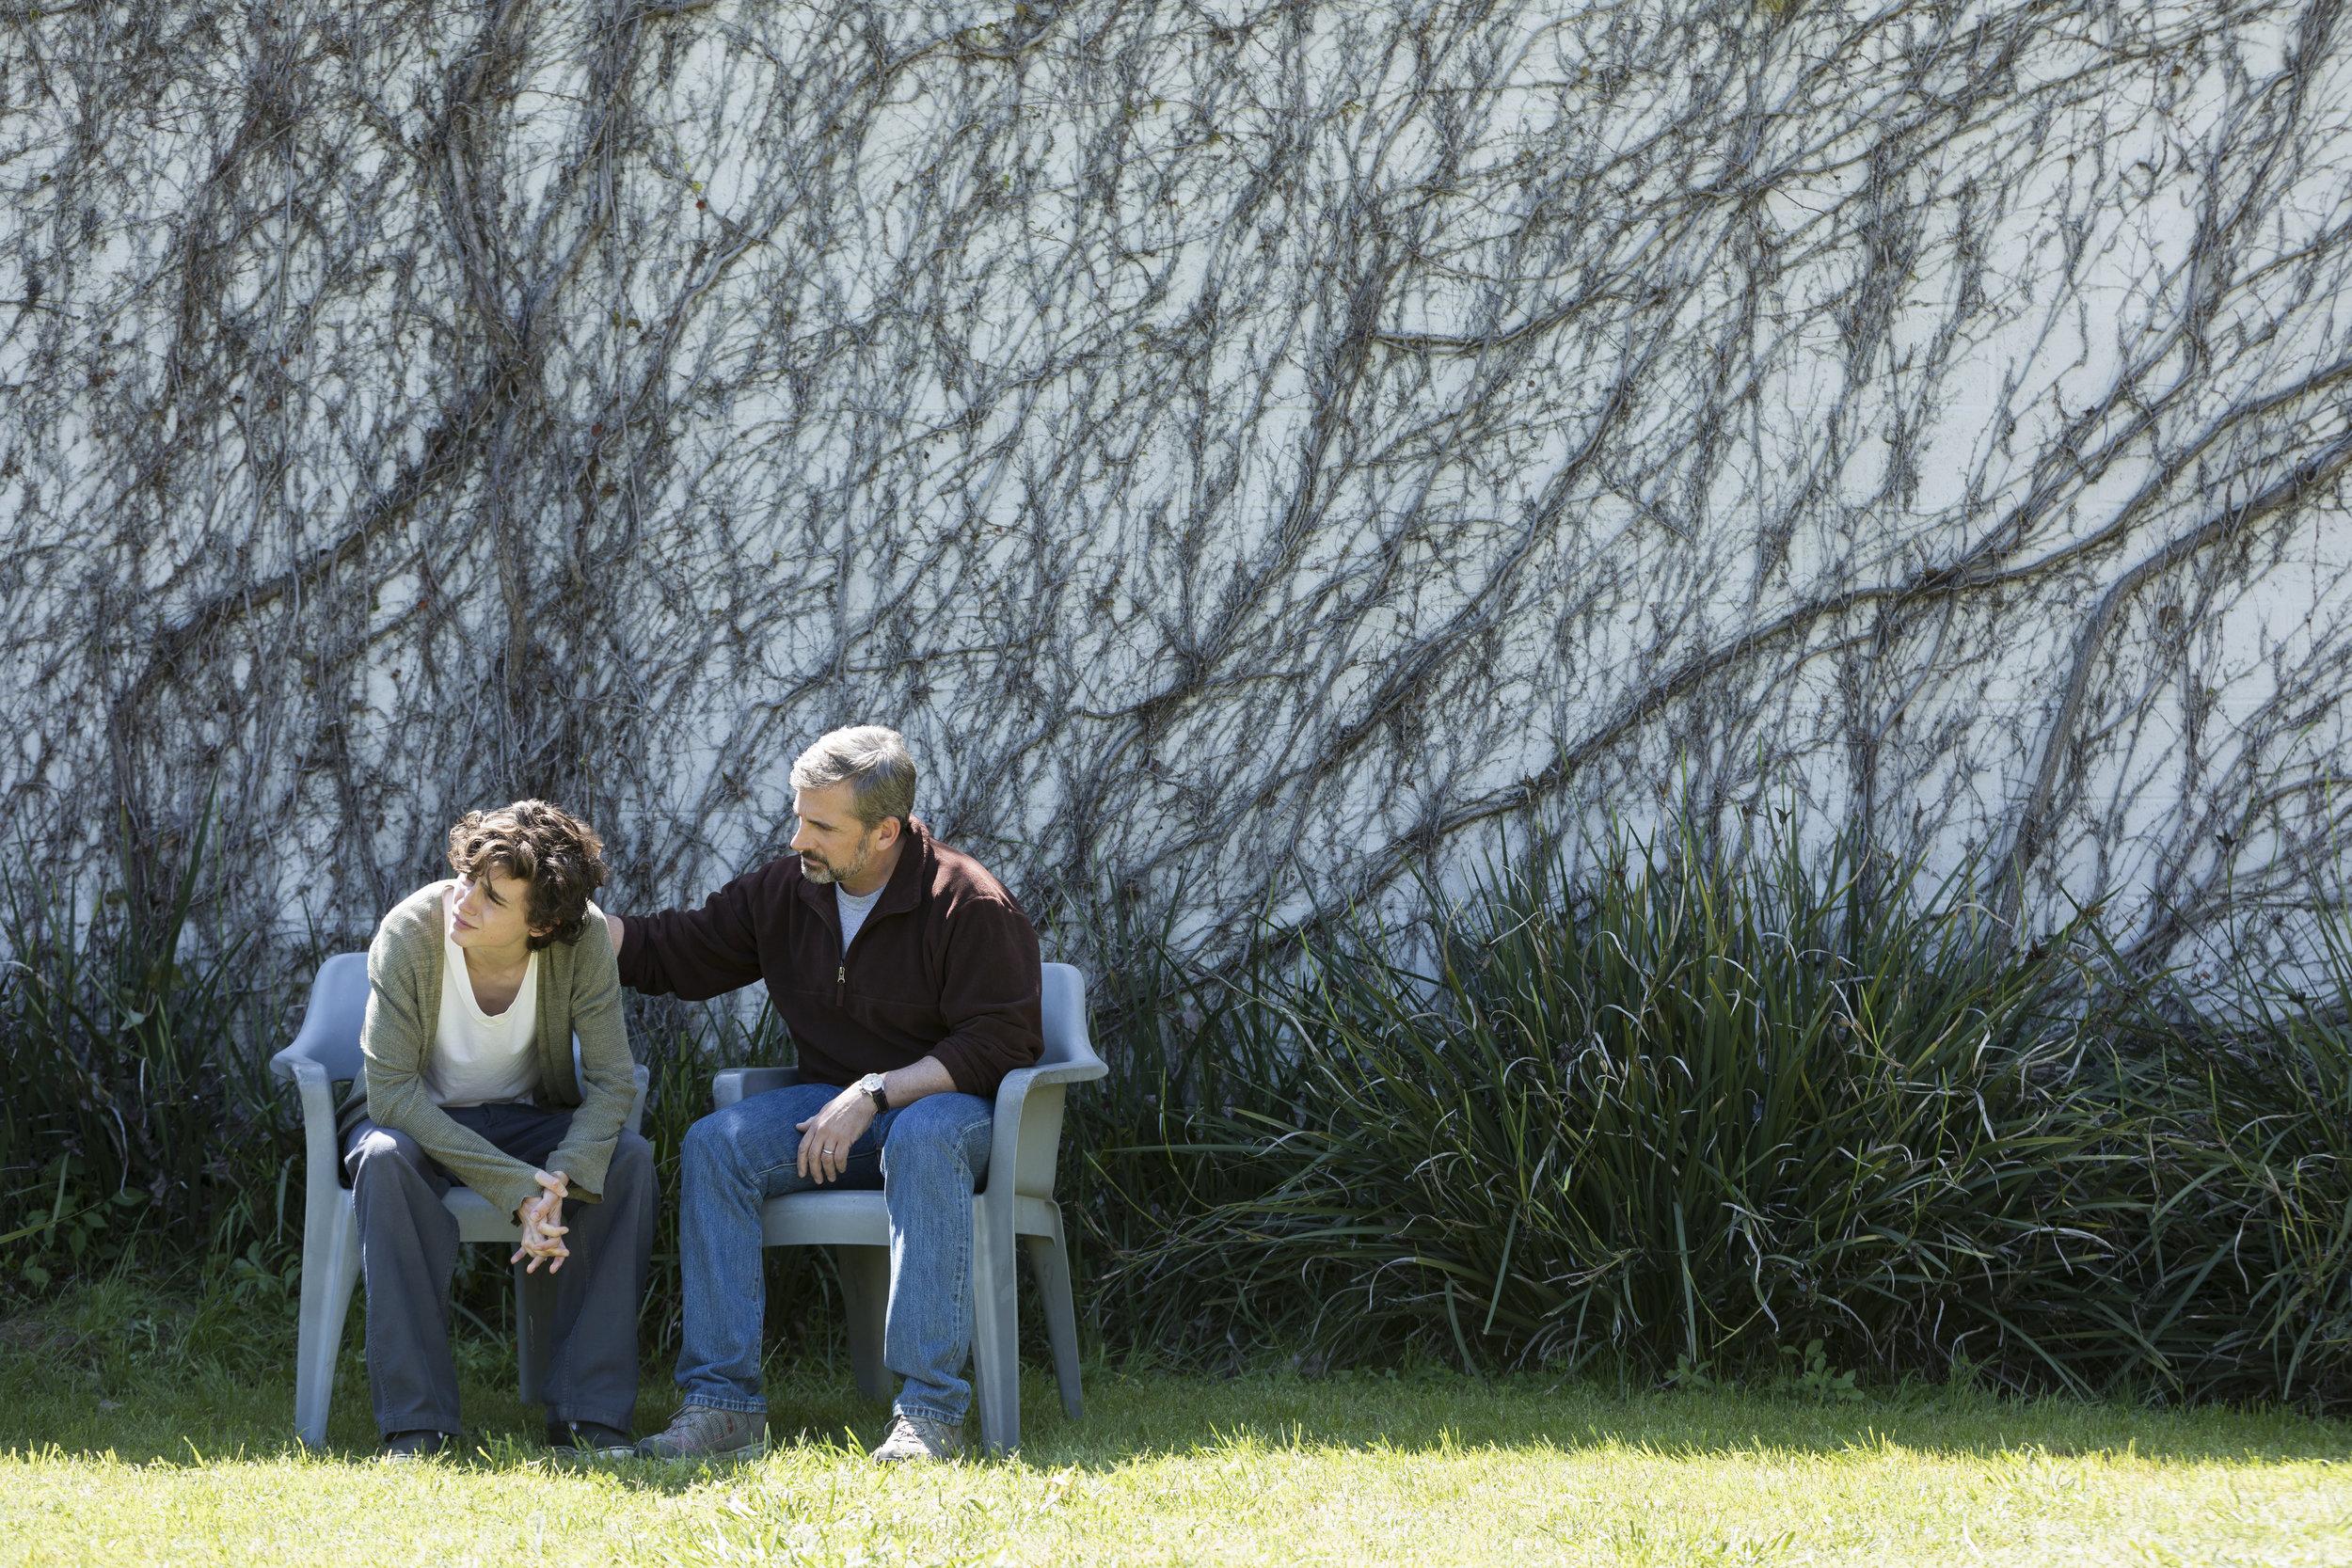 Timoth�e Chalamet as Nic Sheff and Steve Carell as David Scheff star in BEAUTIFUL BOY